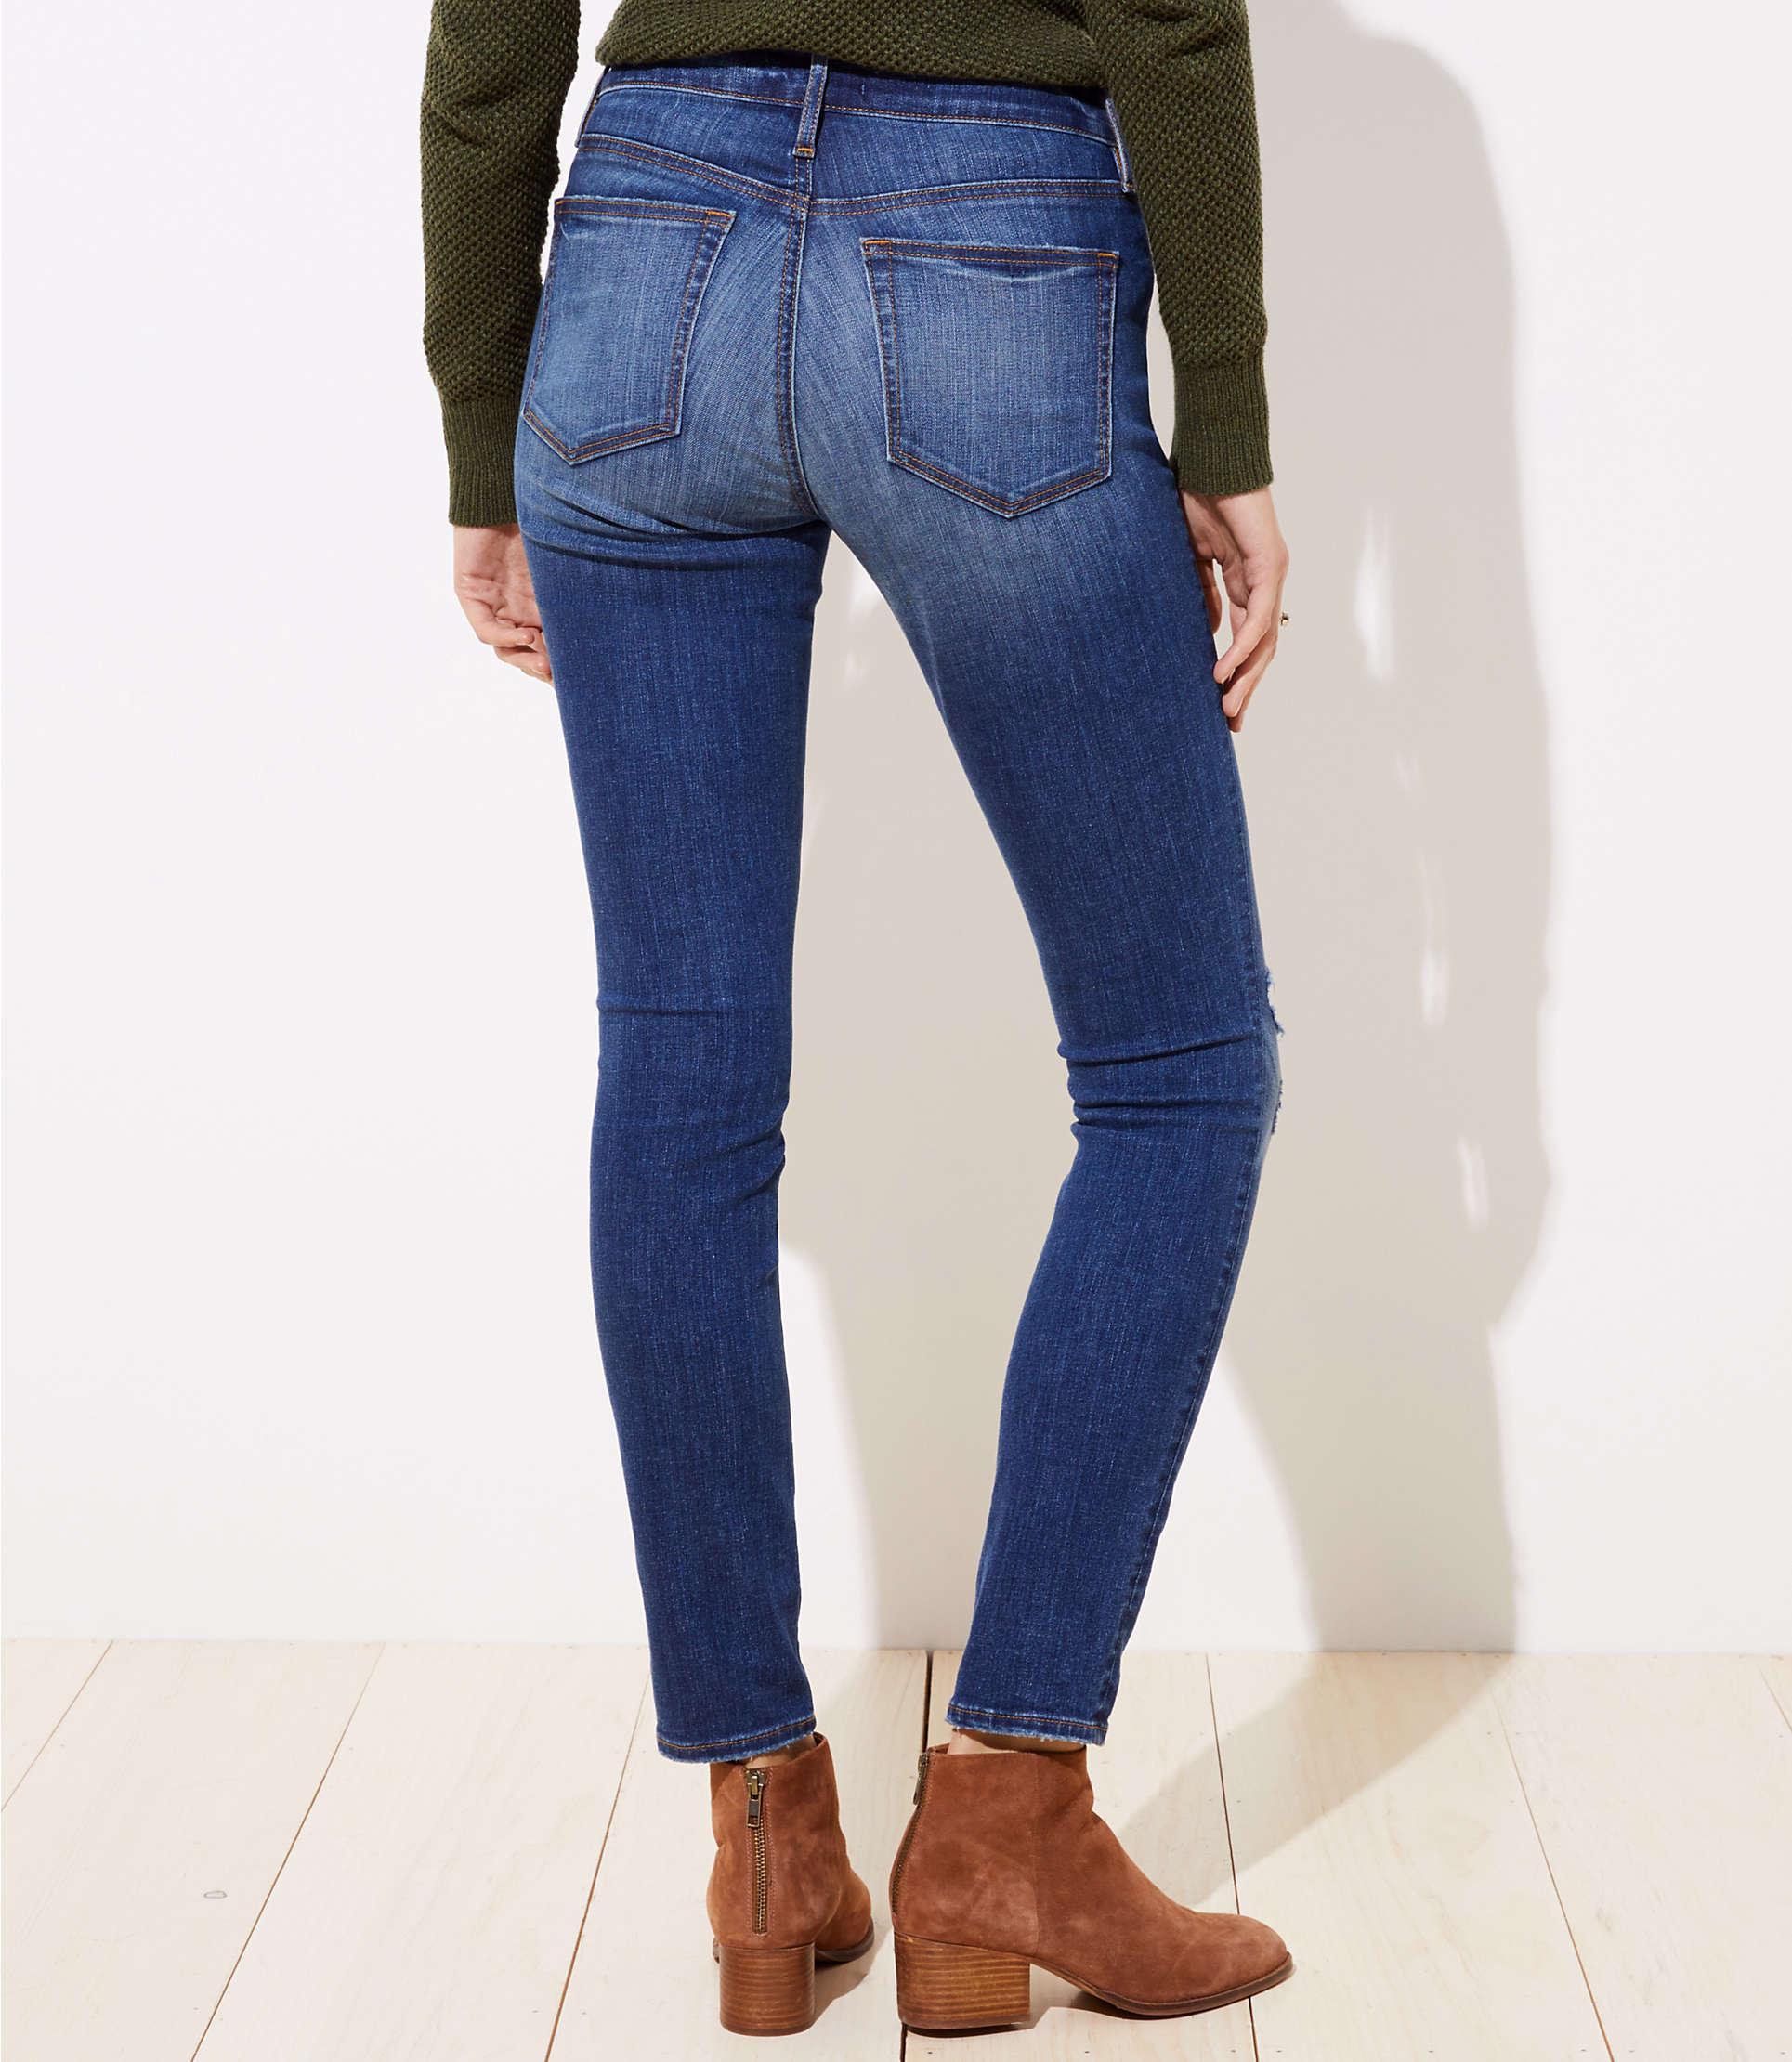 3c5e9163 ... Tall Curvy Destructed Slim Pocket Skinny Jeans In Mid Indigo Wash -  Lyst. View fullscreen